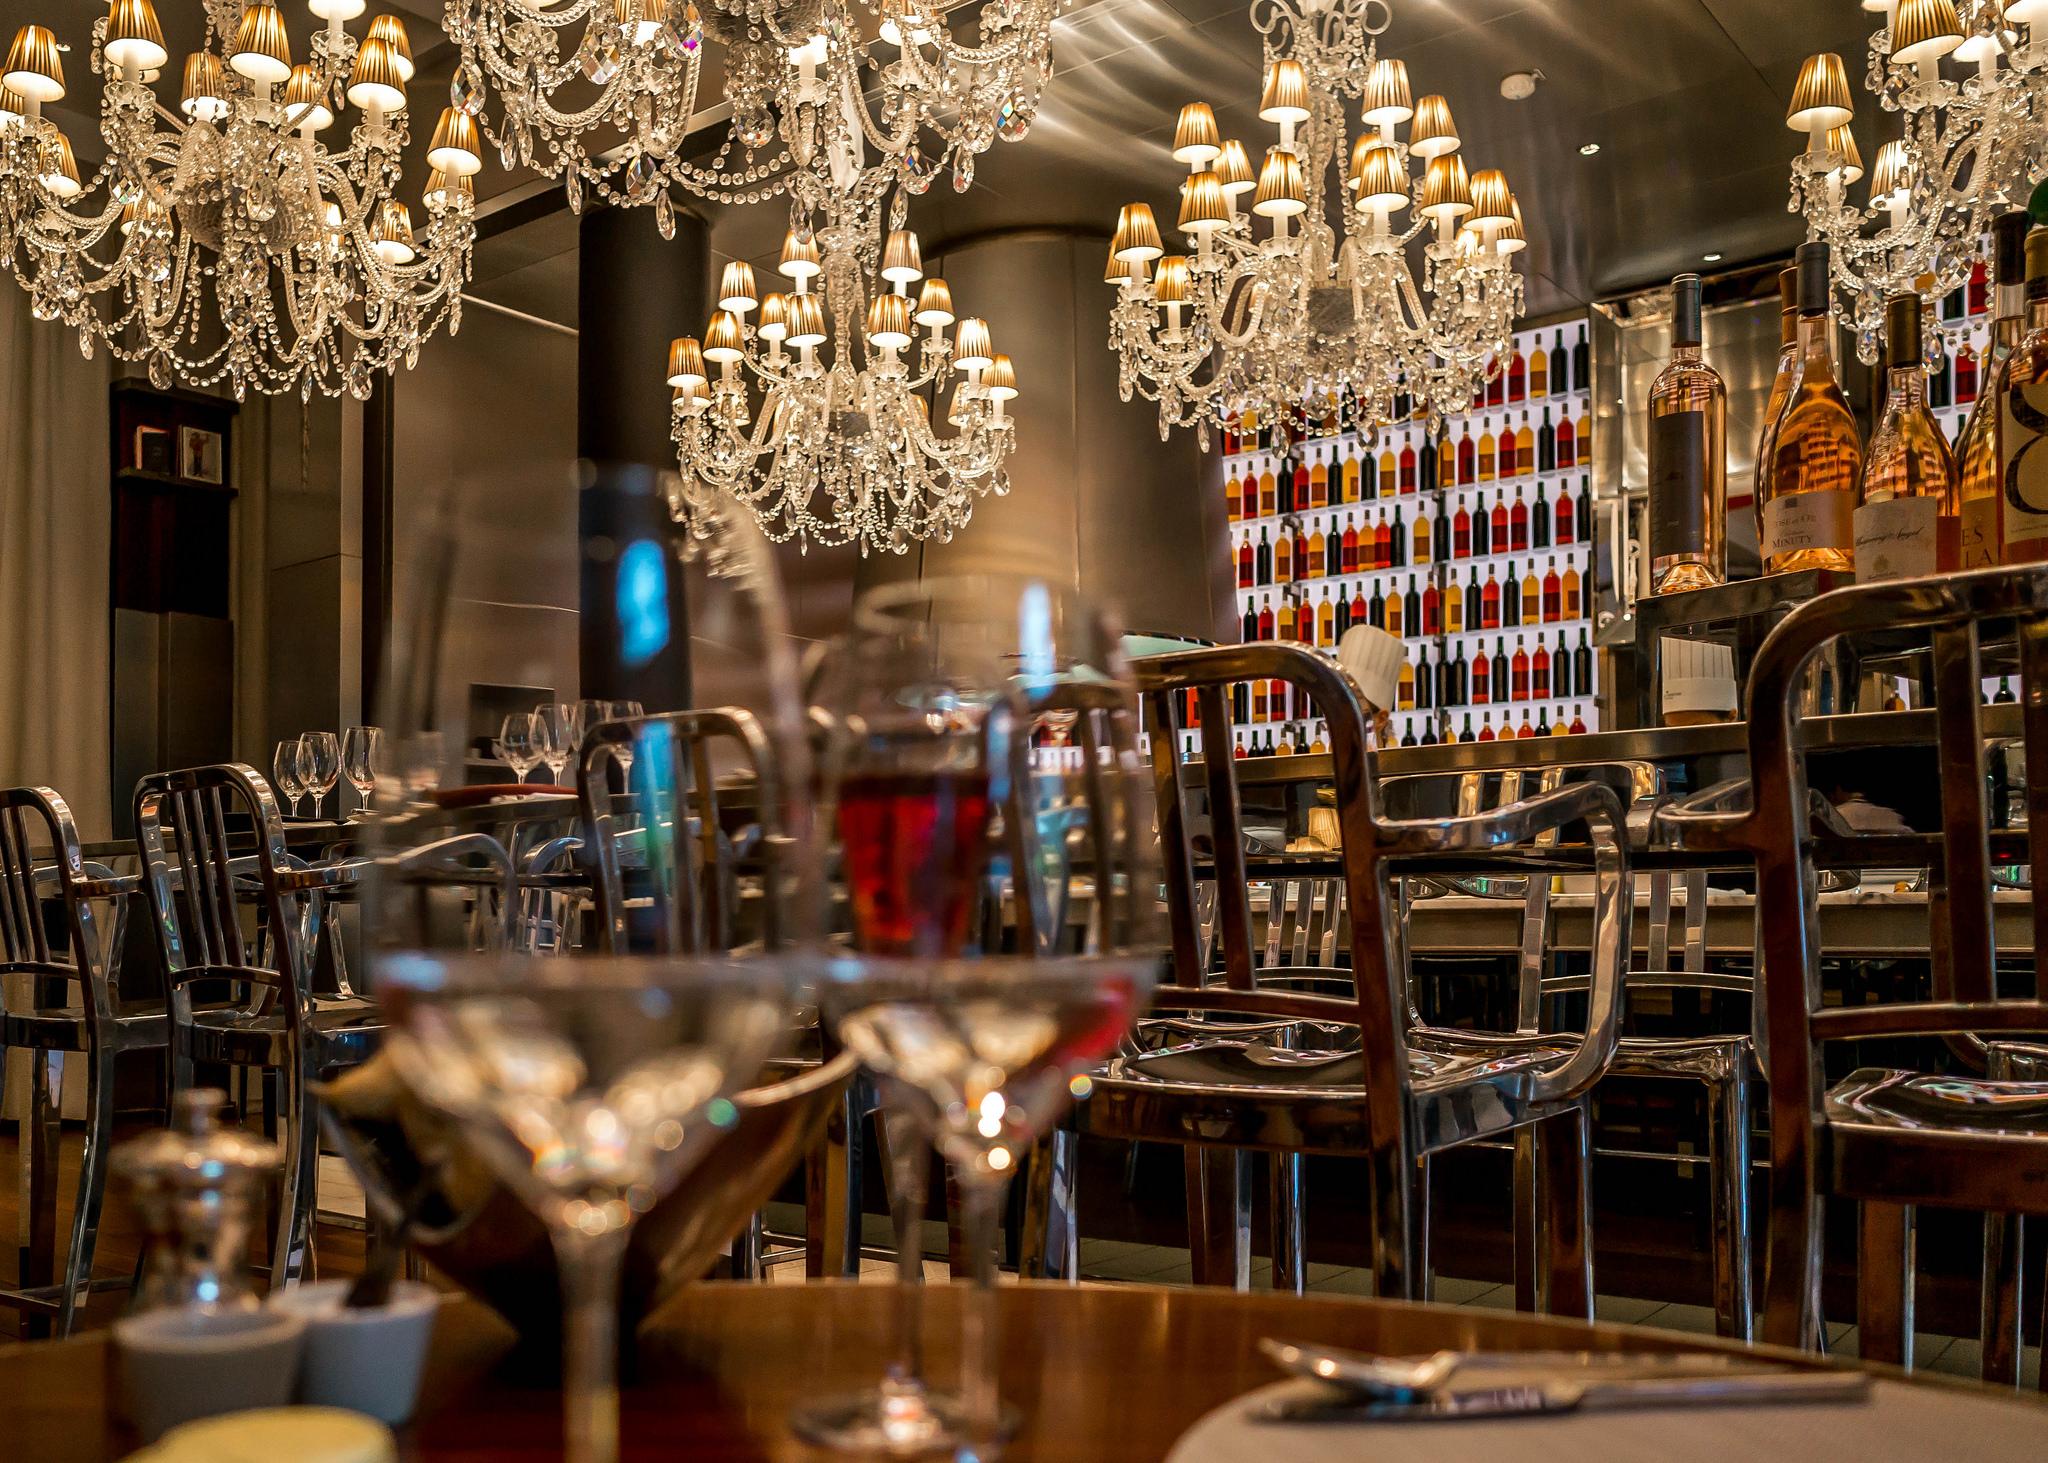 Top 10 late breakfast spots in paris - Royal monceau la cuisine ...